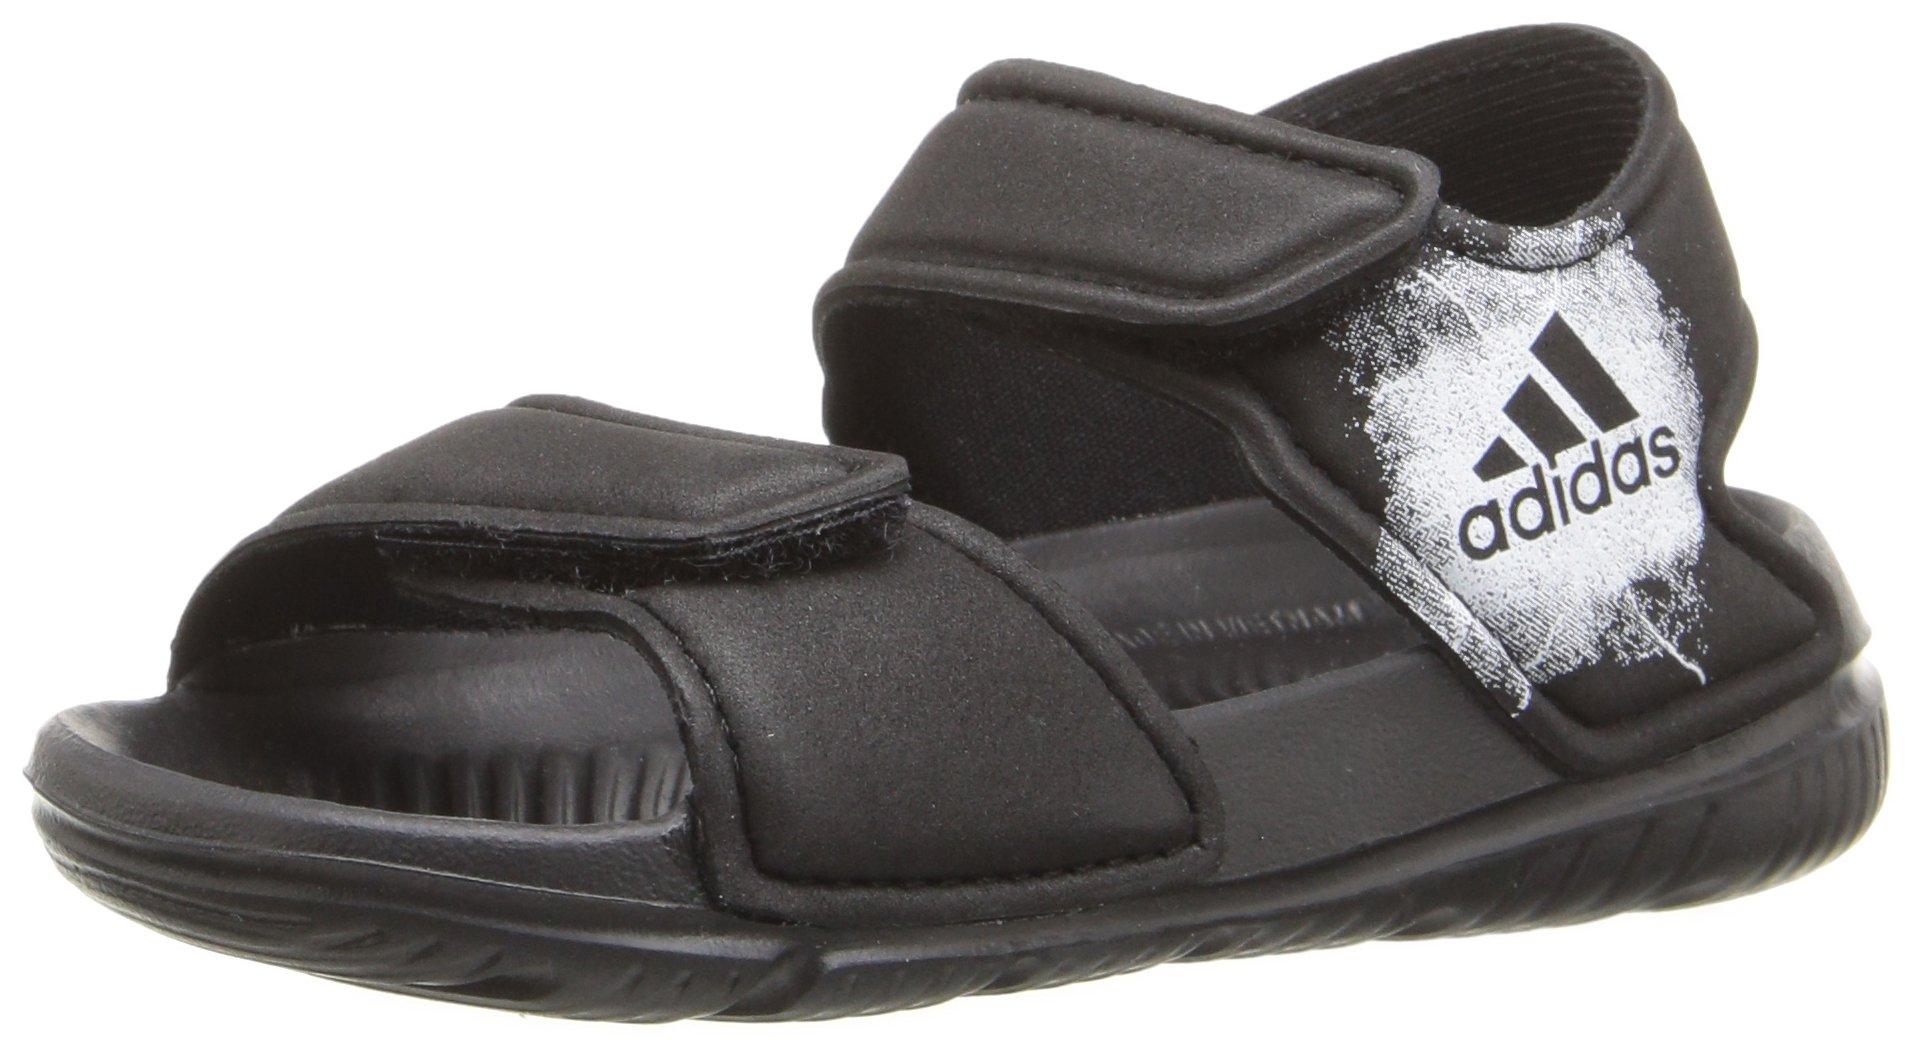 adidas Boys' Altaswim I Sandal, Black/White/Black, 4 M US Toddler